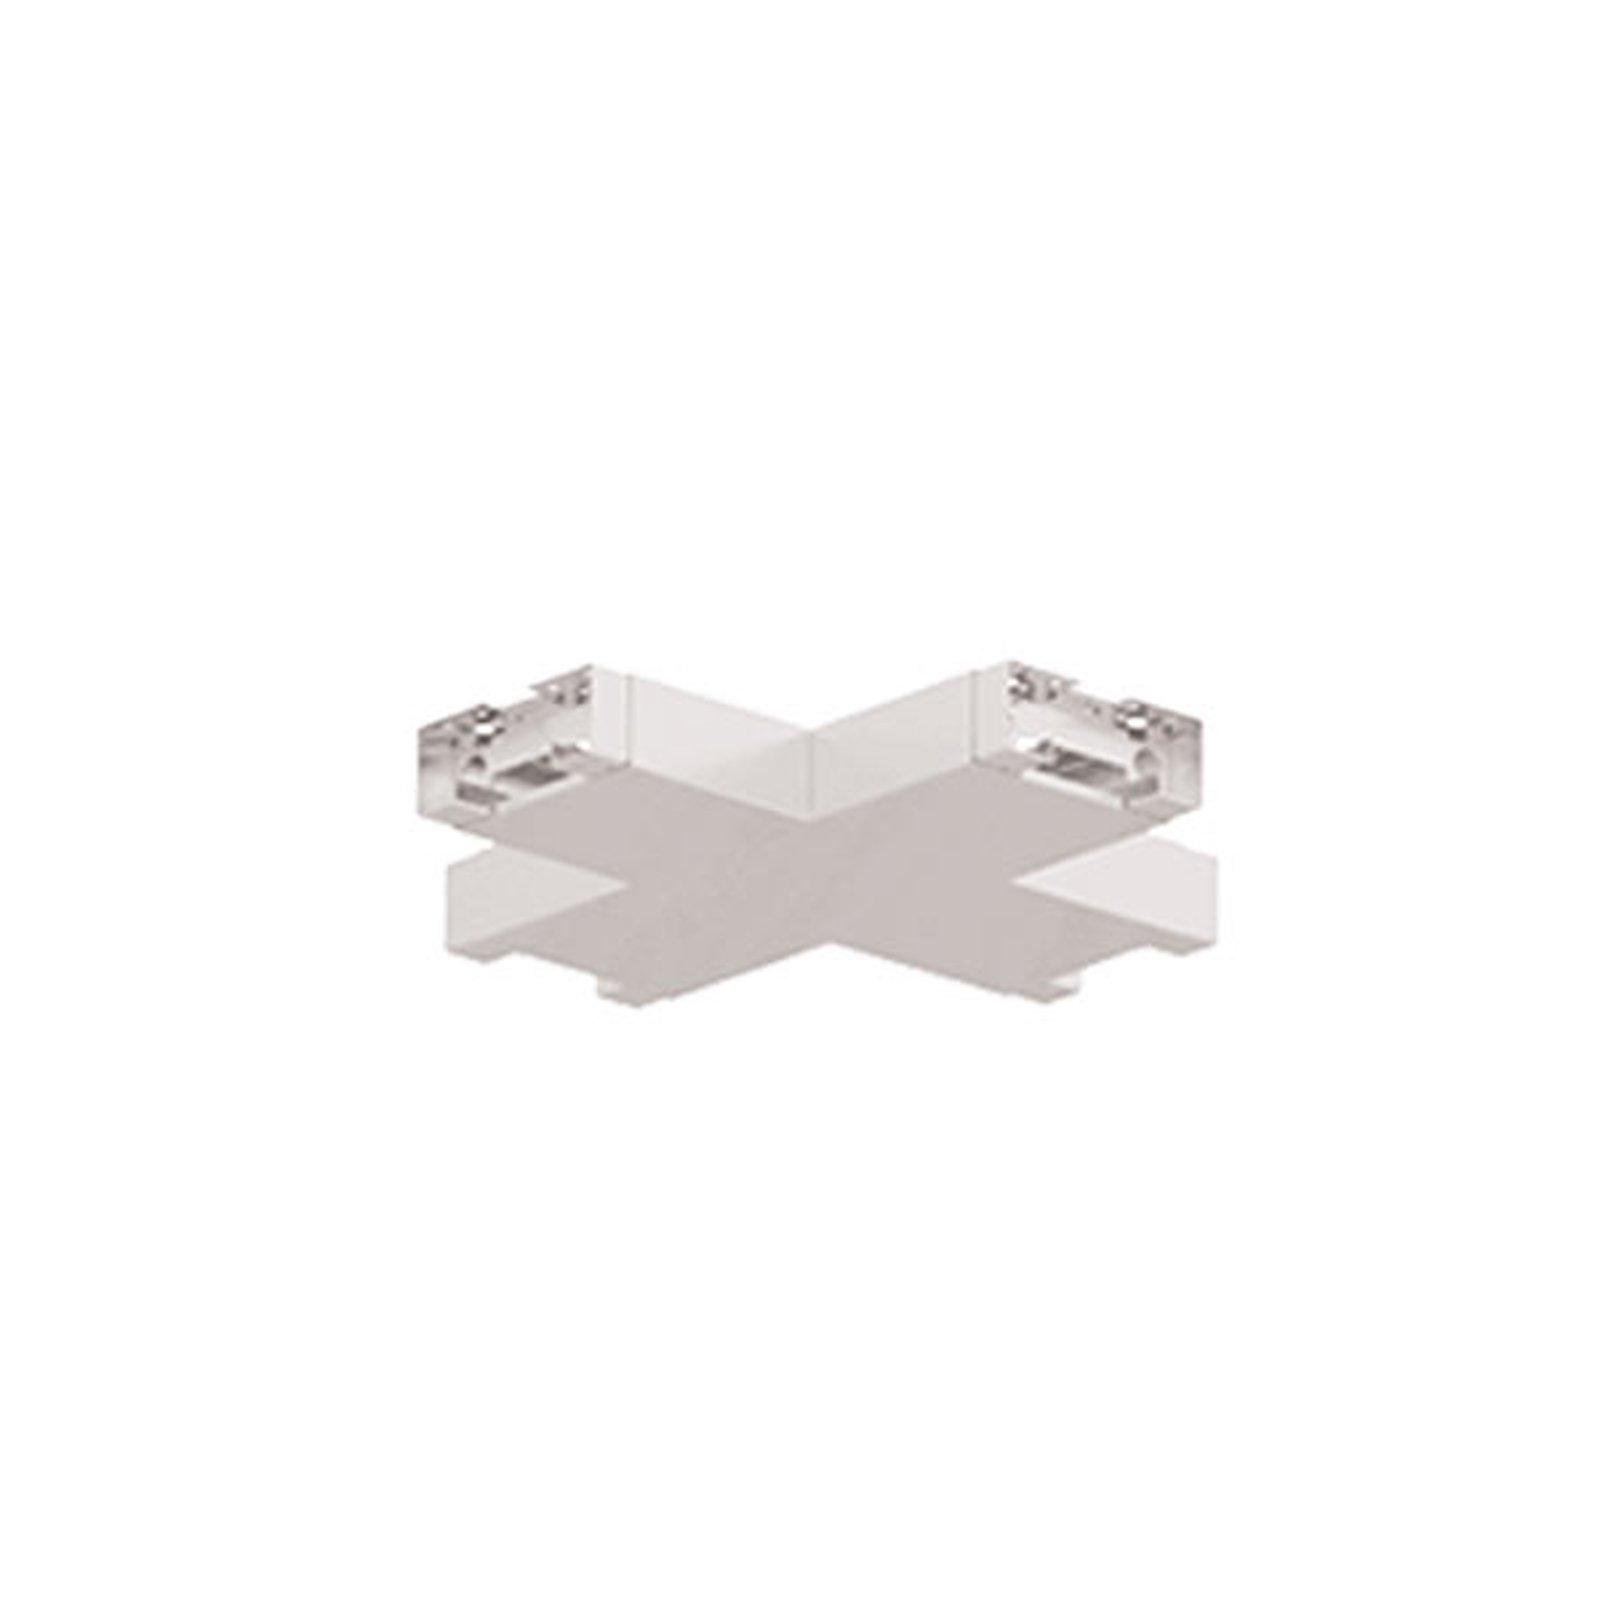 Forbinder Procube-CUVK-1 X90° for DL Procube